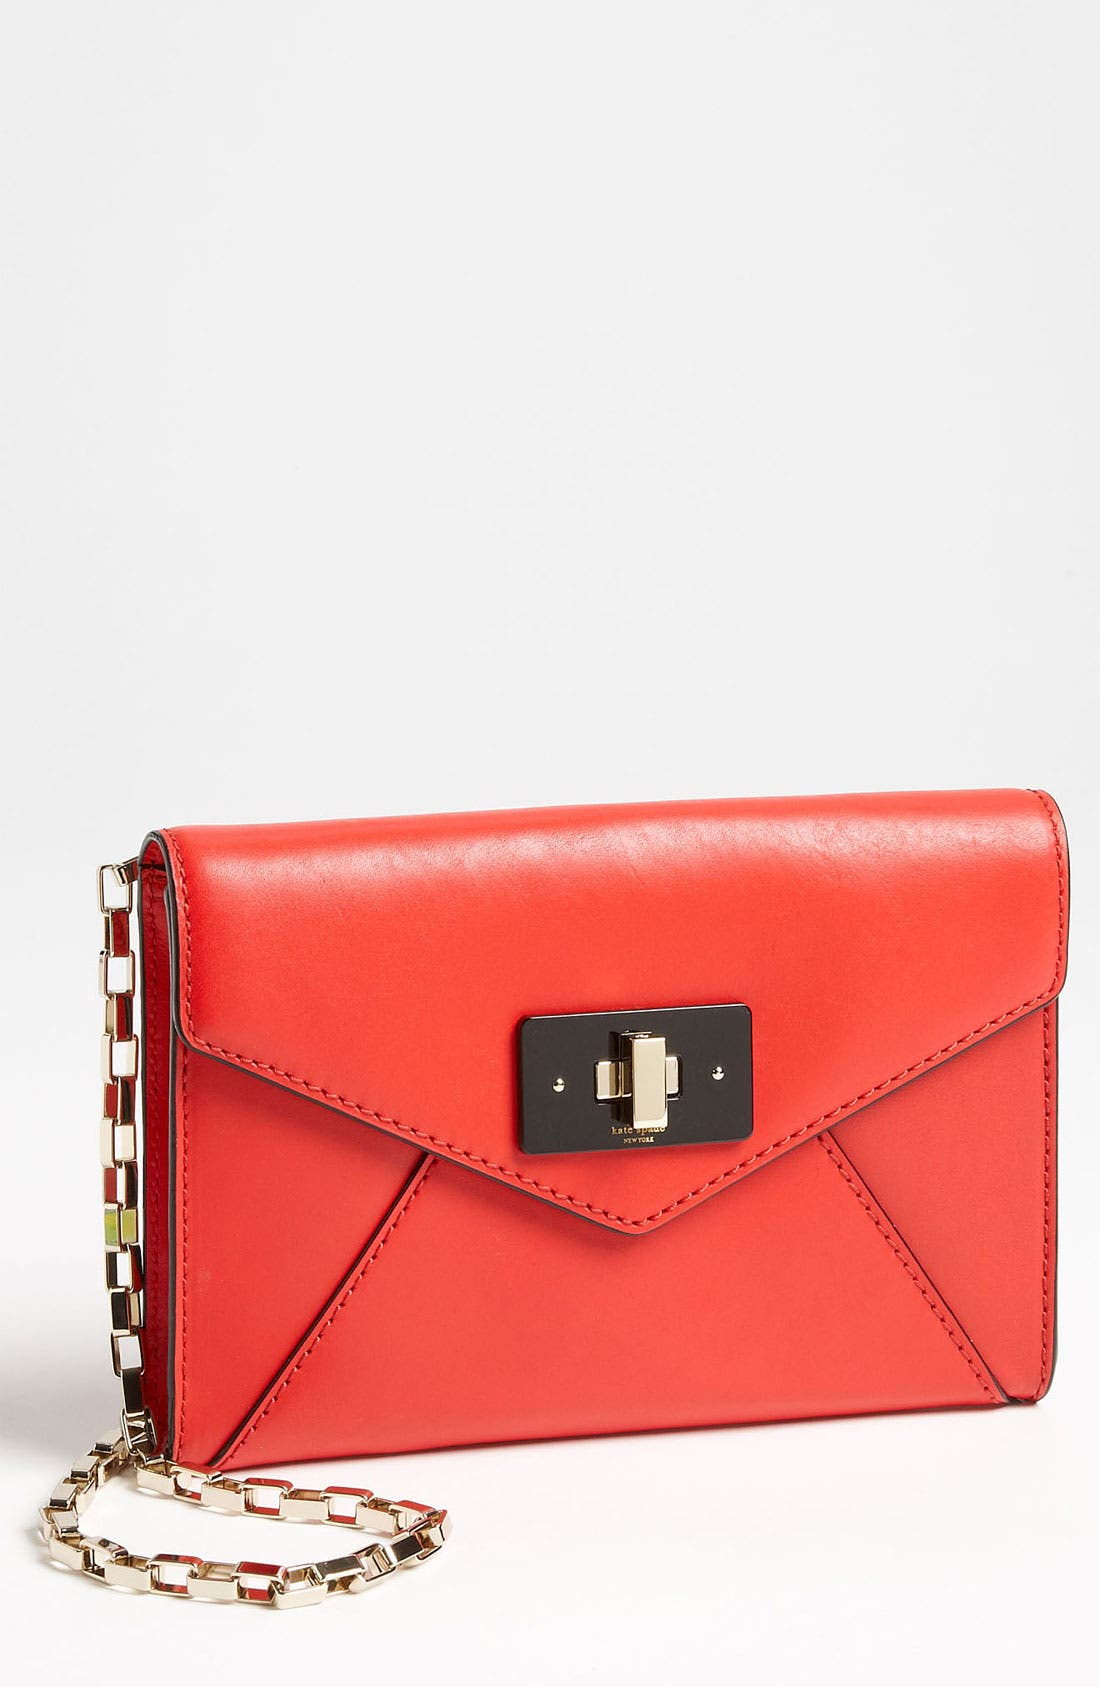 Alternate Image 1 Selected - kate spade new york 'post street - sonia' crossbody bag